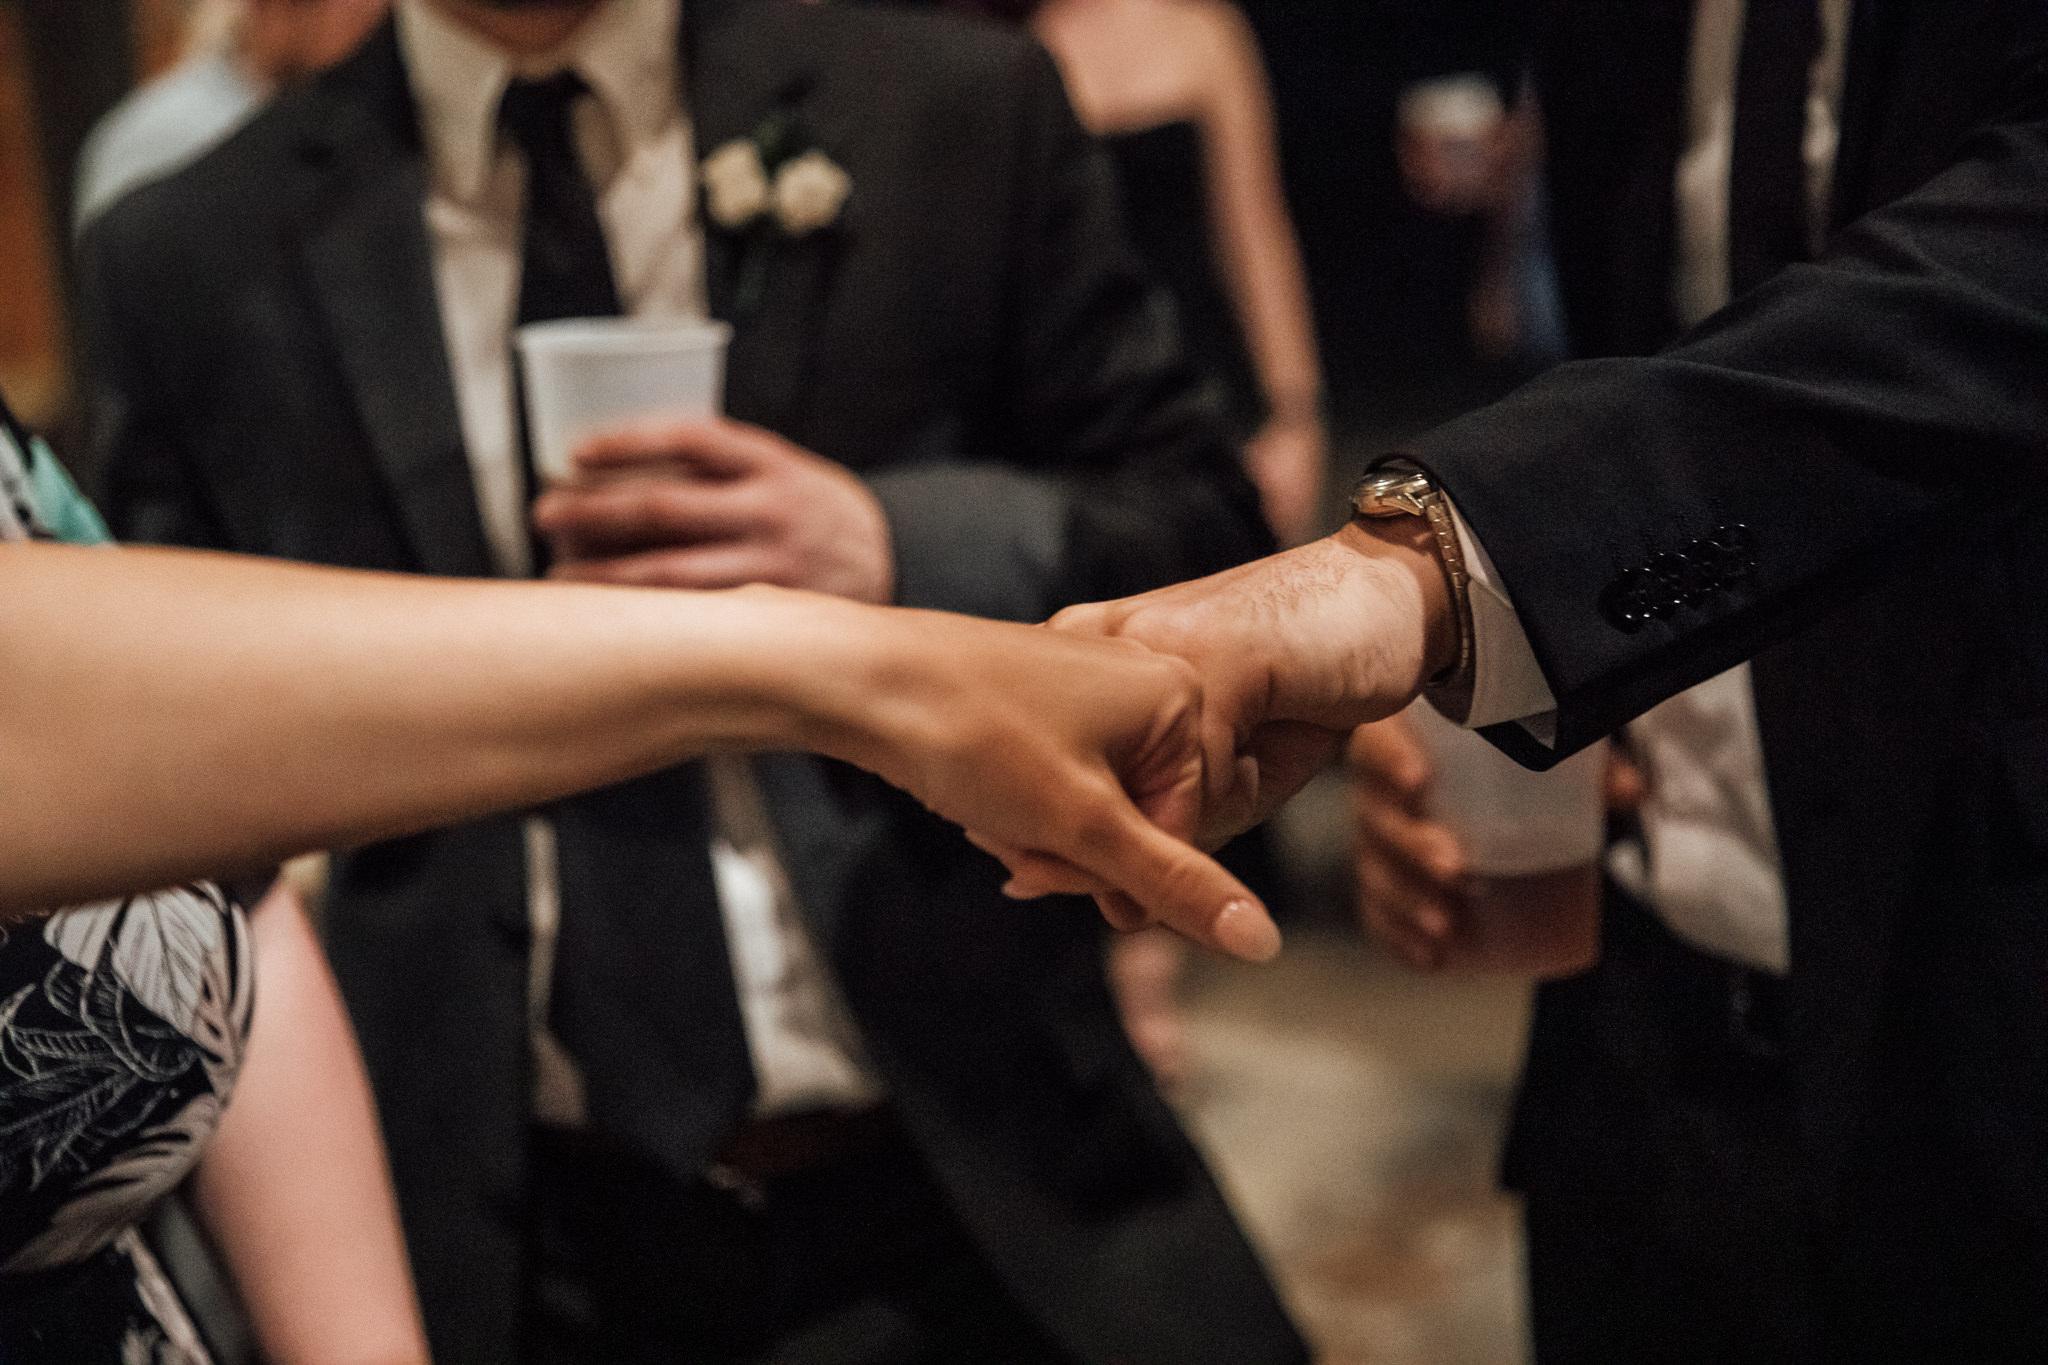 phantom-canyon-brewery-colorado-springs-wedding-photographer-458.jpg